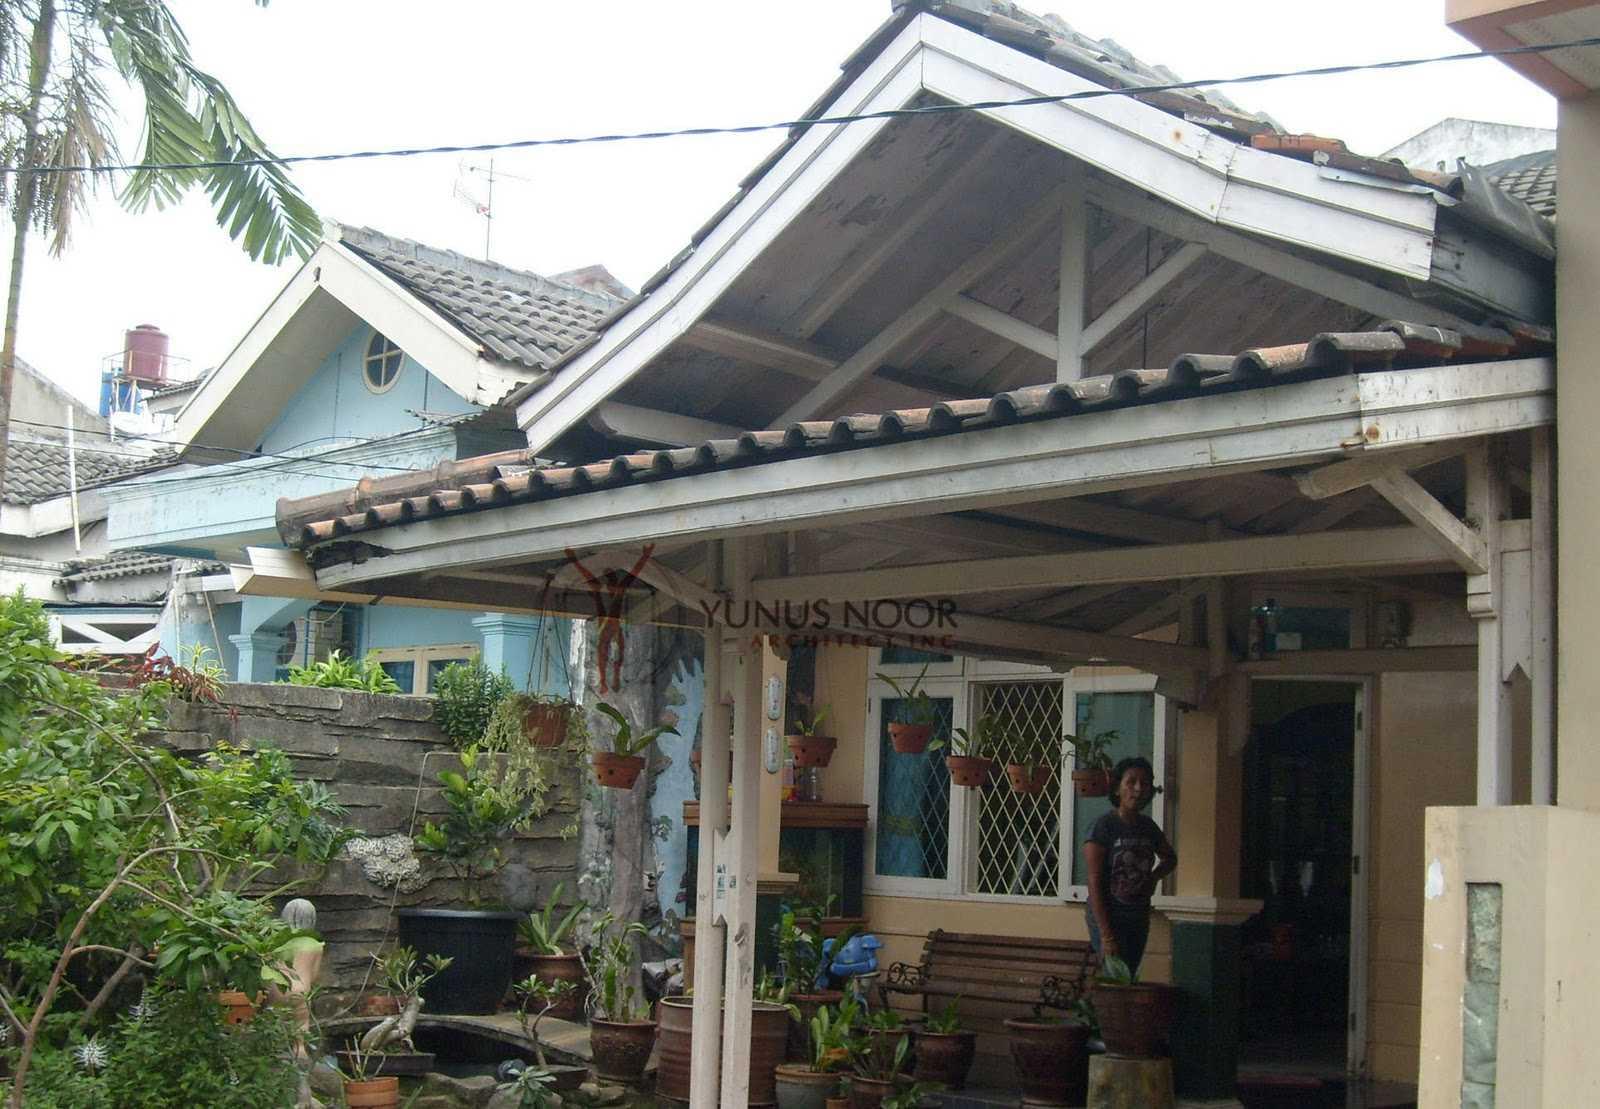 Yunus Noor Capt. Lalu House Jalan Raya Pondok Gede, Jatiwaringin, Pondokgede, Jatiwaringin, Pondokgede, Kota Bks, Jawa Barat 17411, Indonesia  Yunus-Noor-Capt-Lalu-House  54936